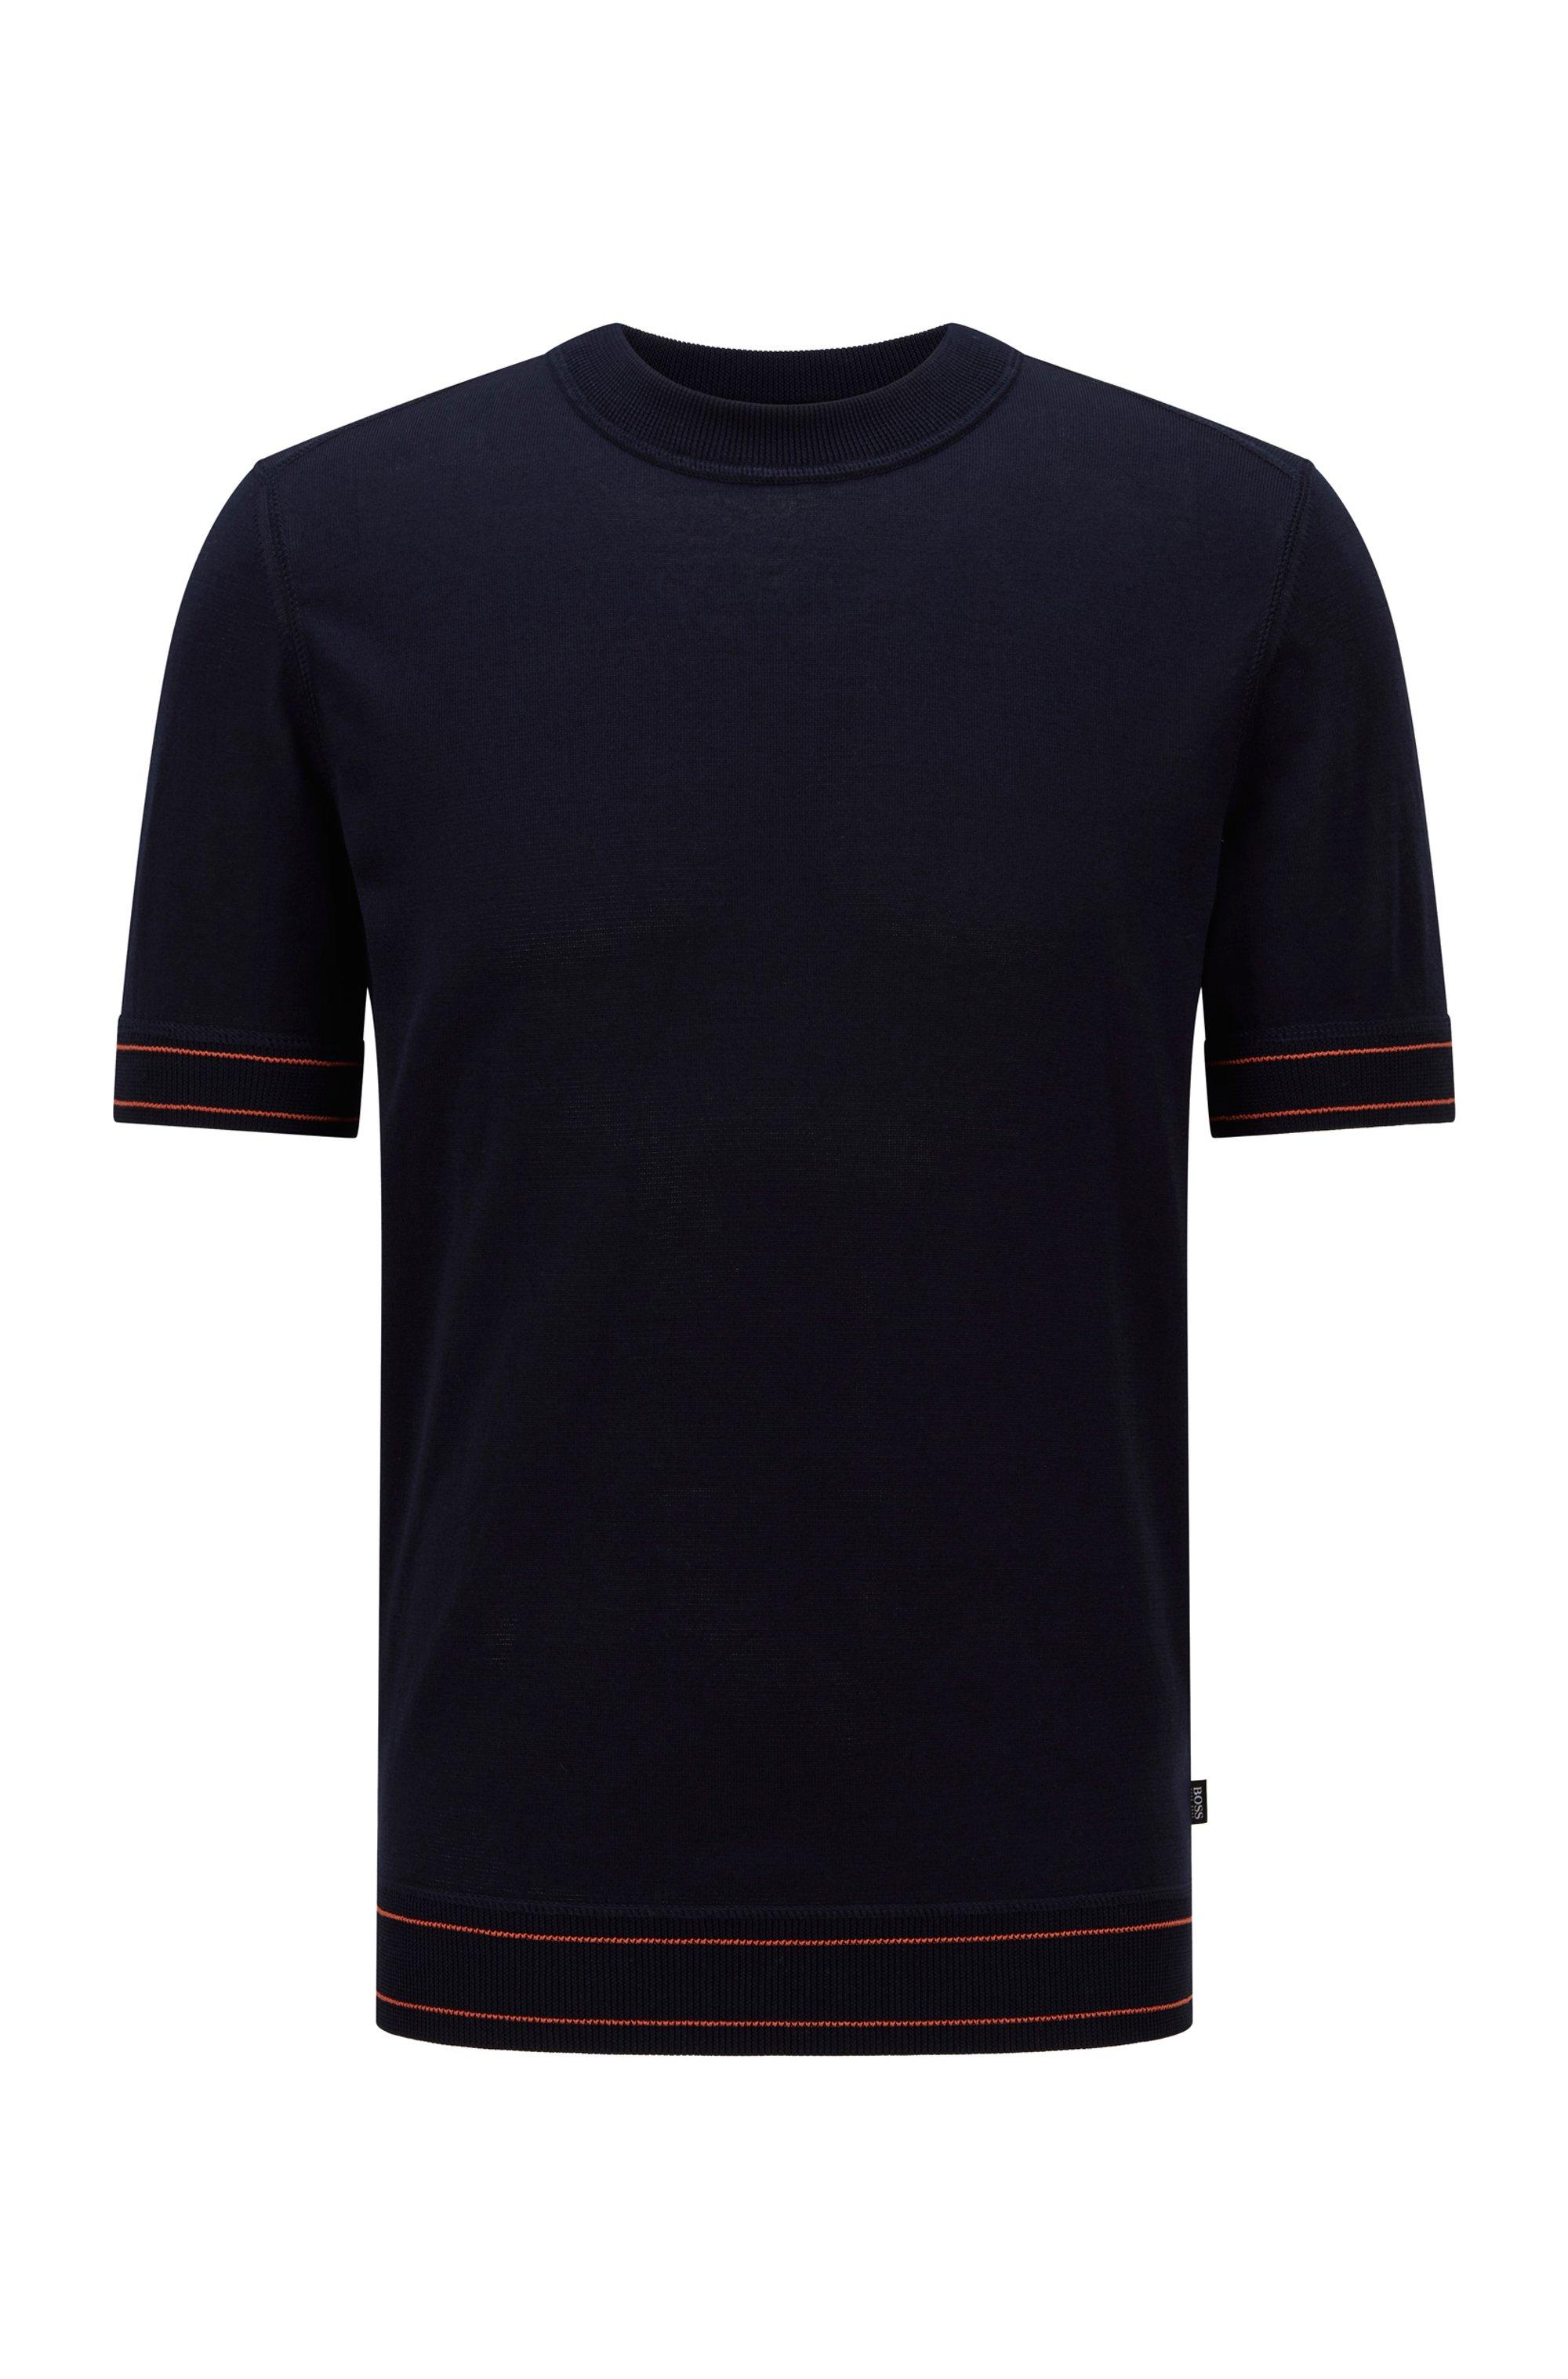 T-shirt-style sweater in mercerized cotton, Dark Blue